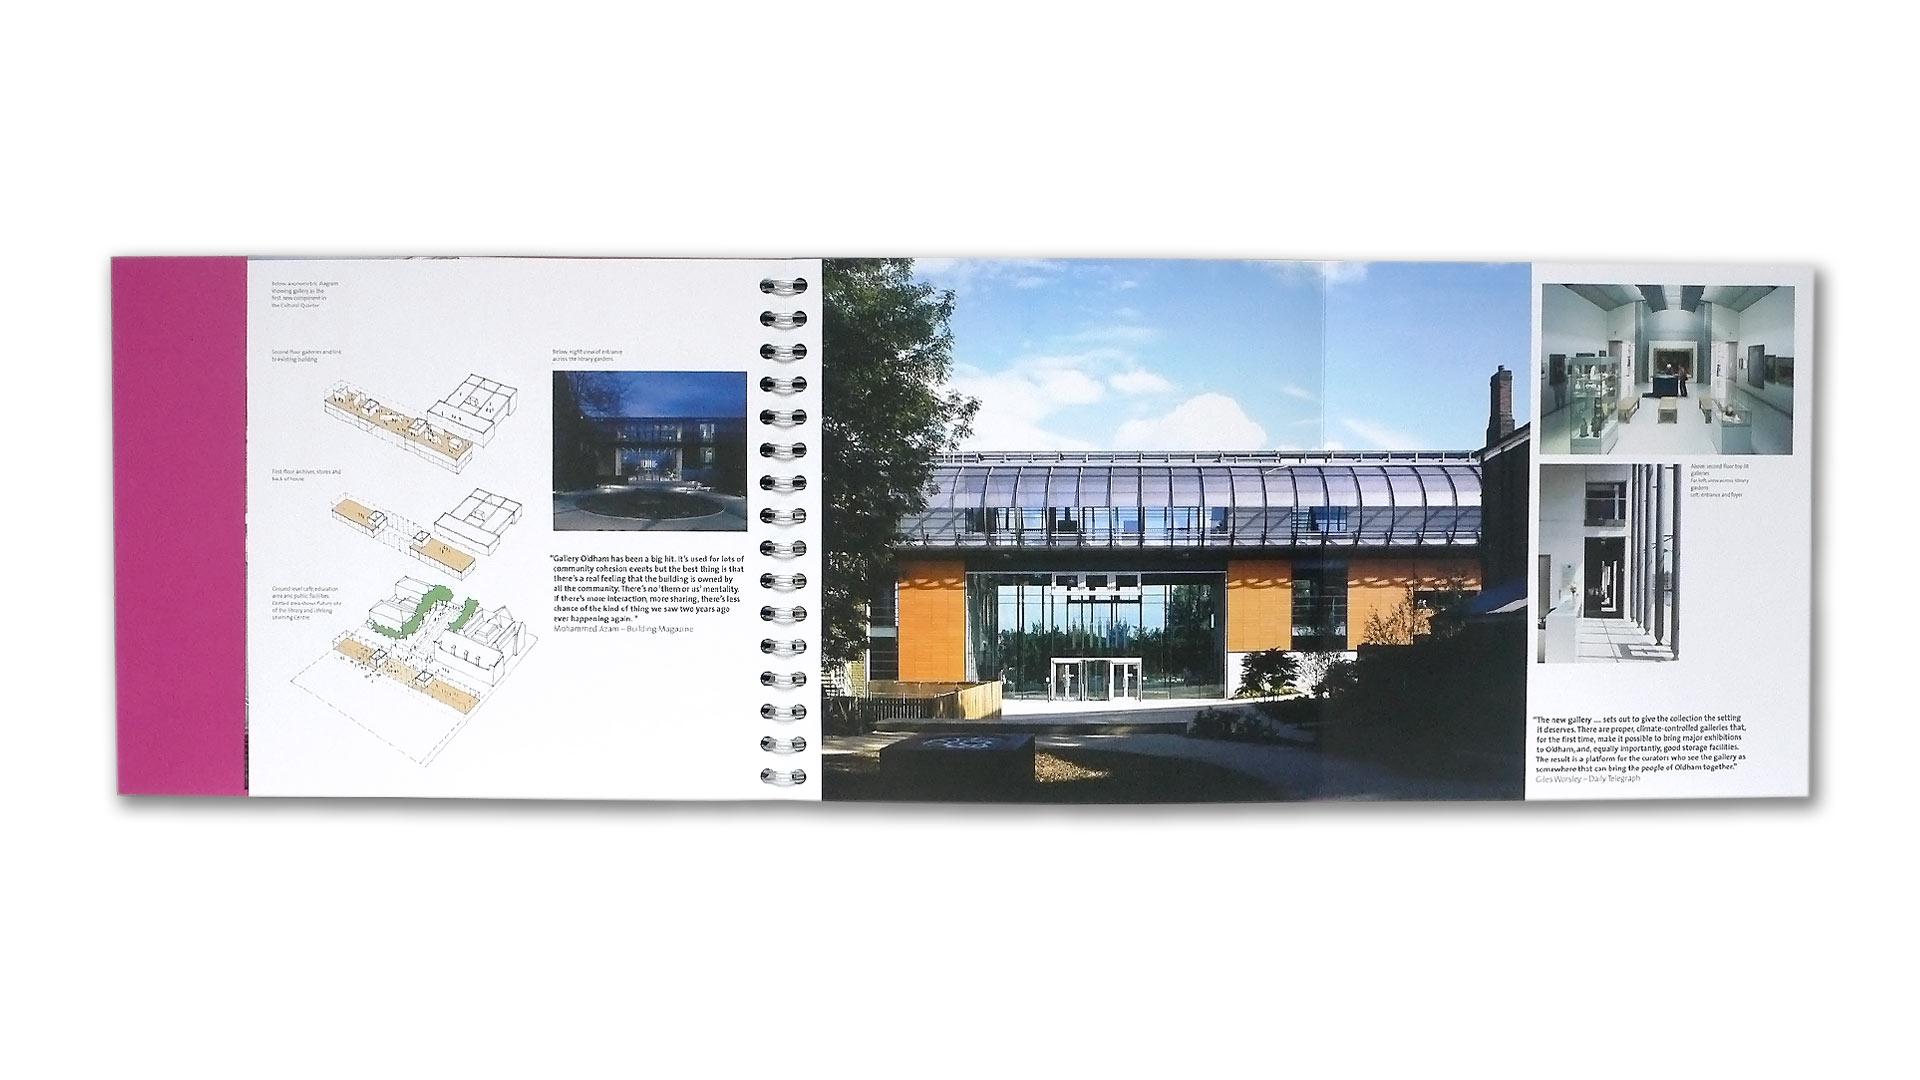 Amato Pringle Richards Sharratt Portfolio | Thomas Manss & Company TS07